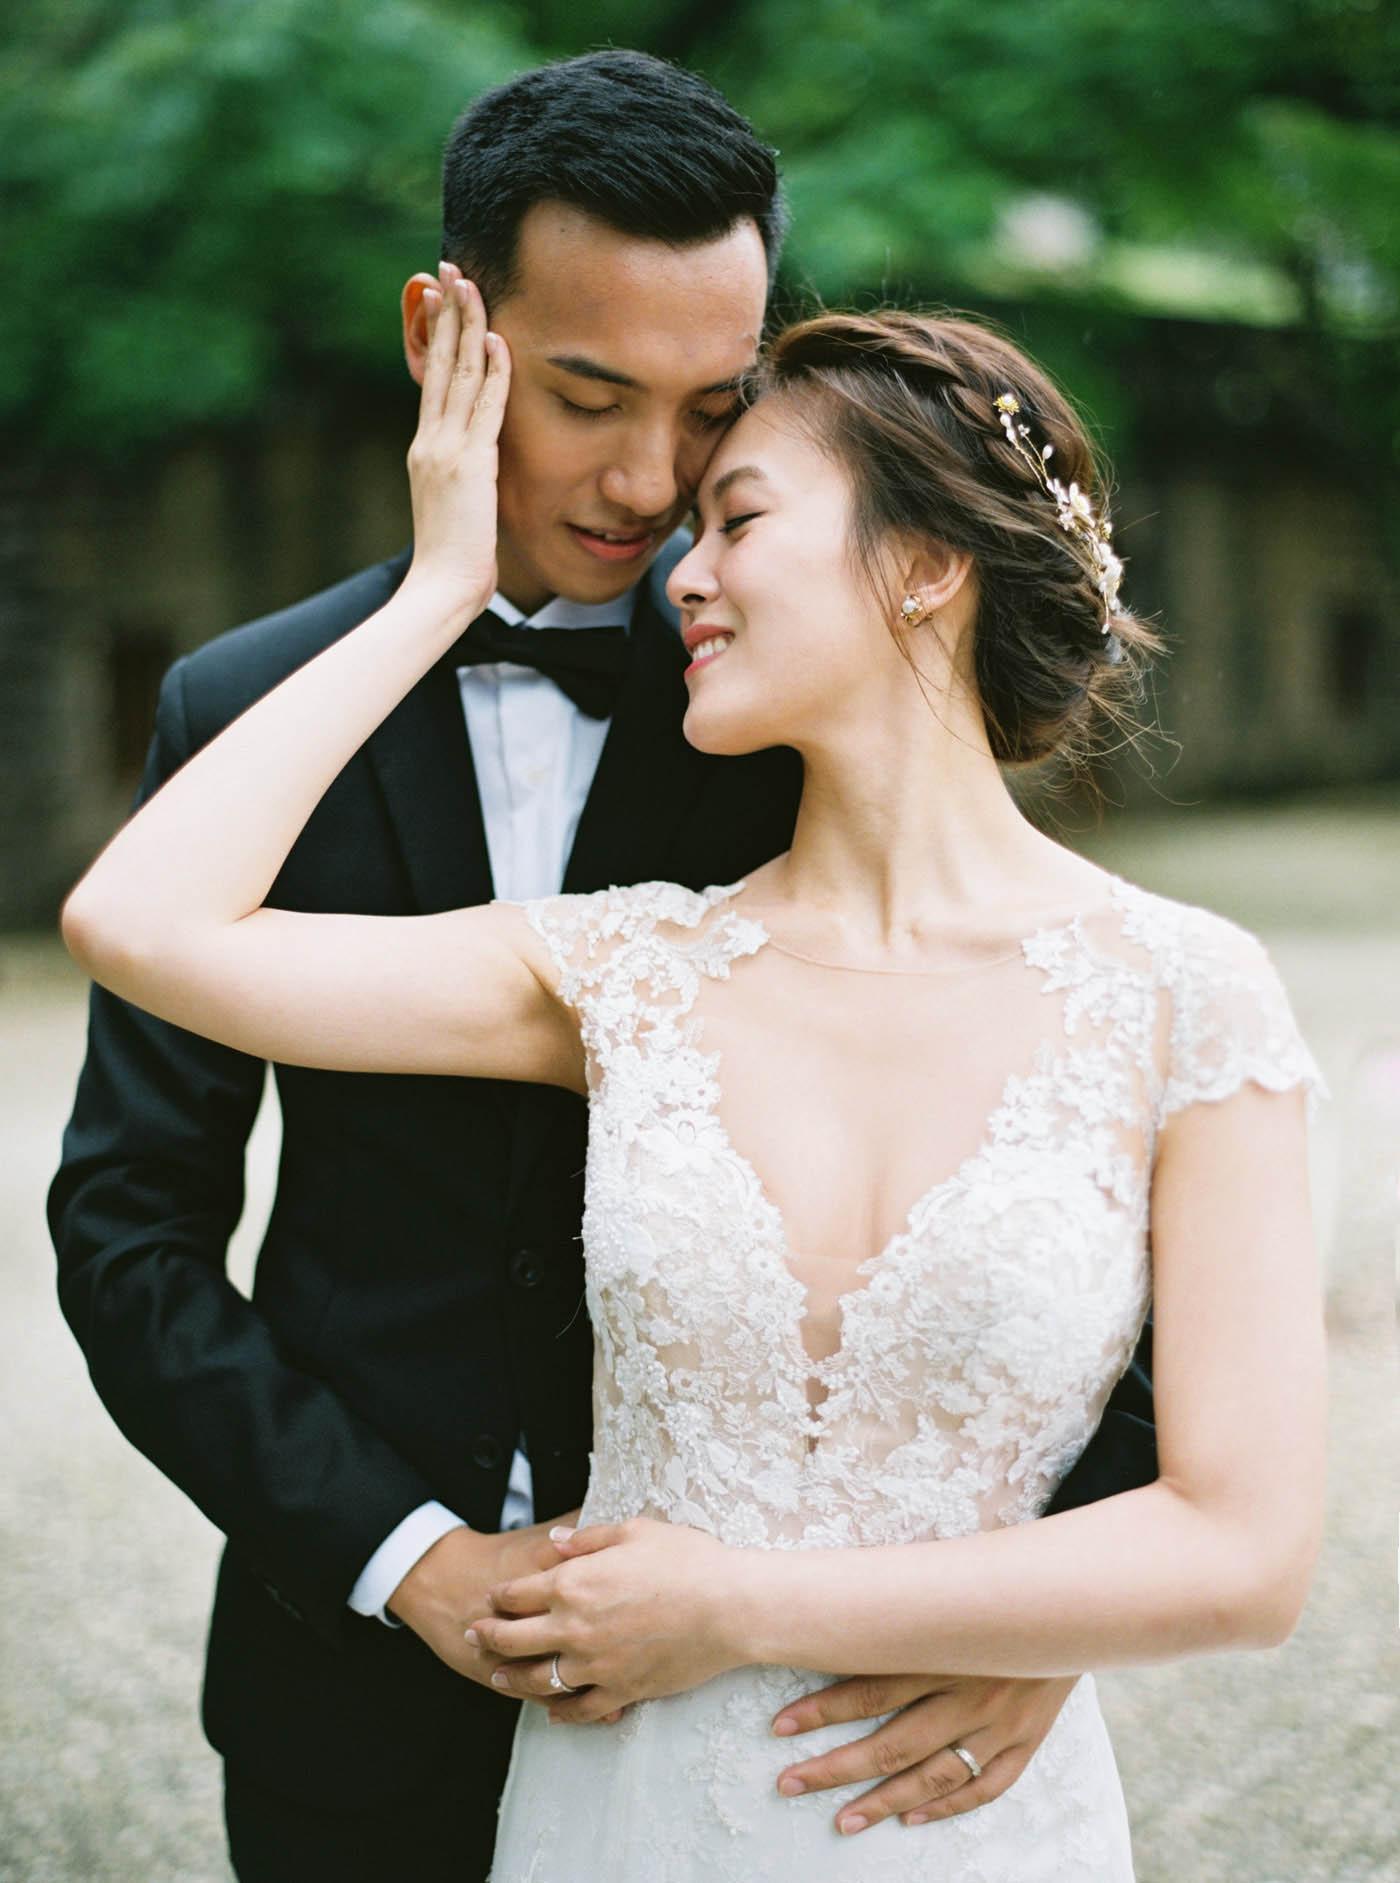 Le Chic 婚紗